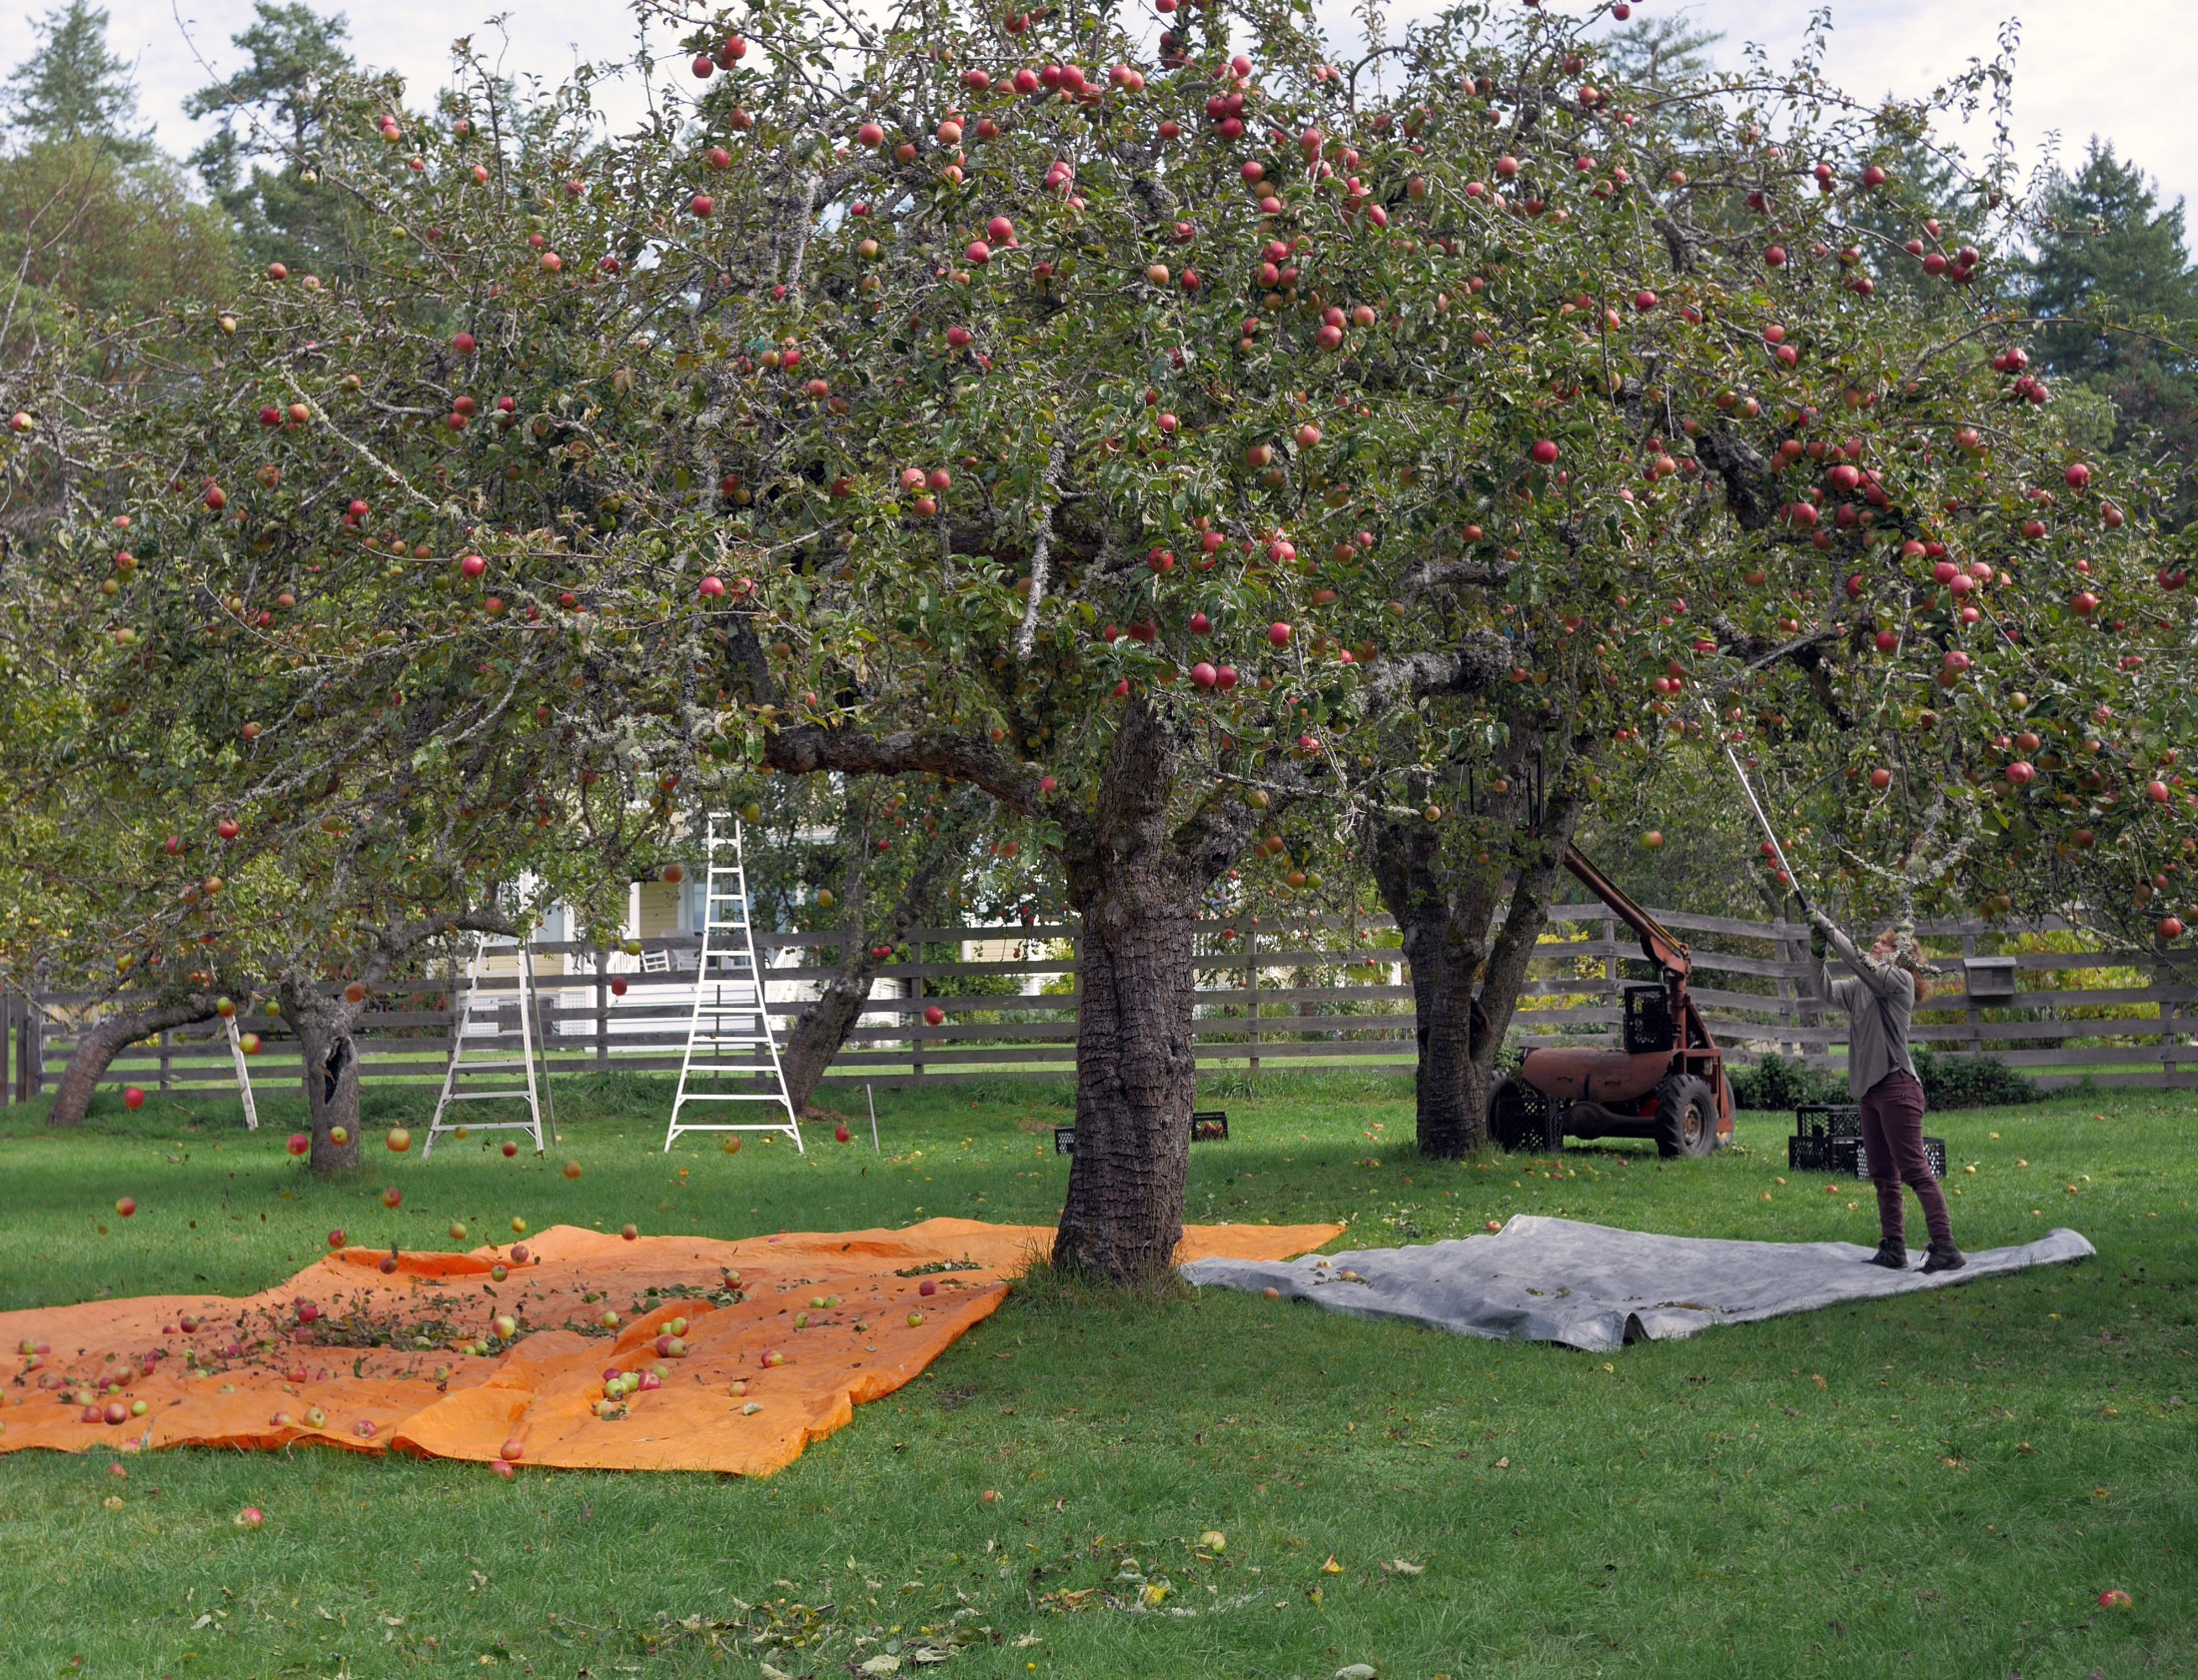 Twin Island Cider's Carla Turner harvesting apples.